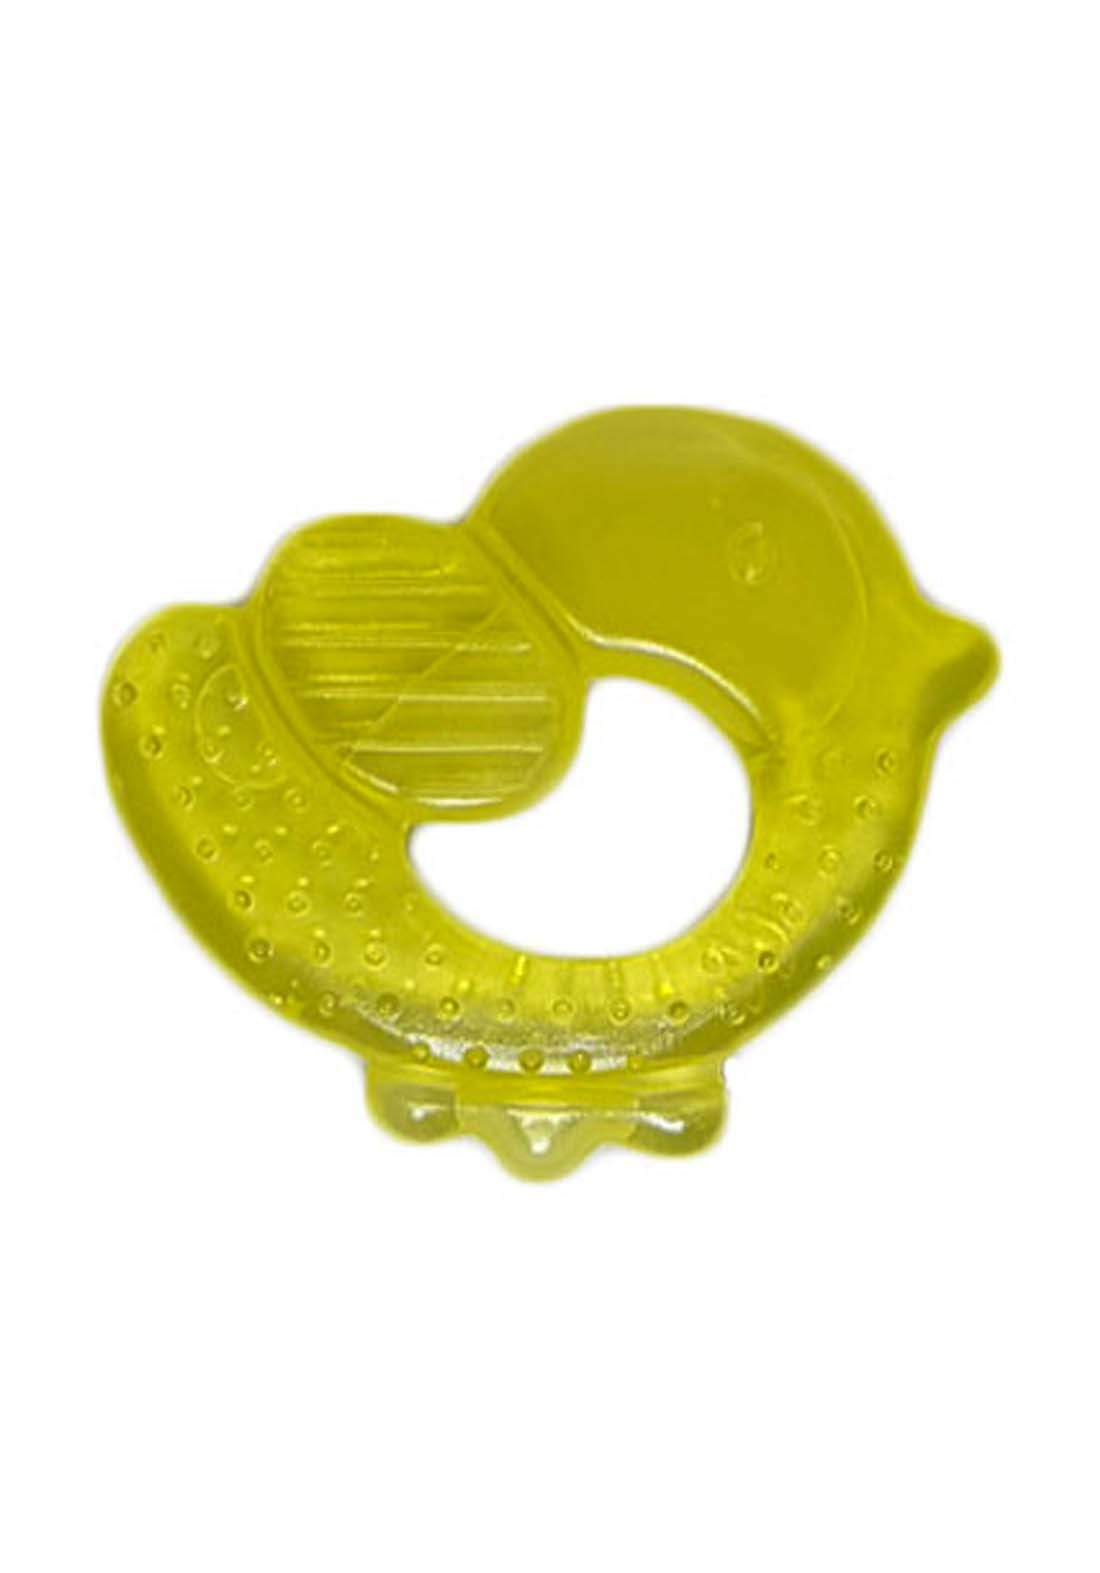 Optimal Water Filled Teether - Duck عظاظة أطفال